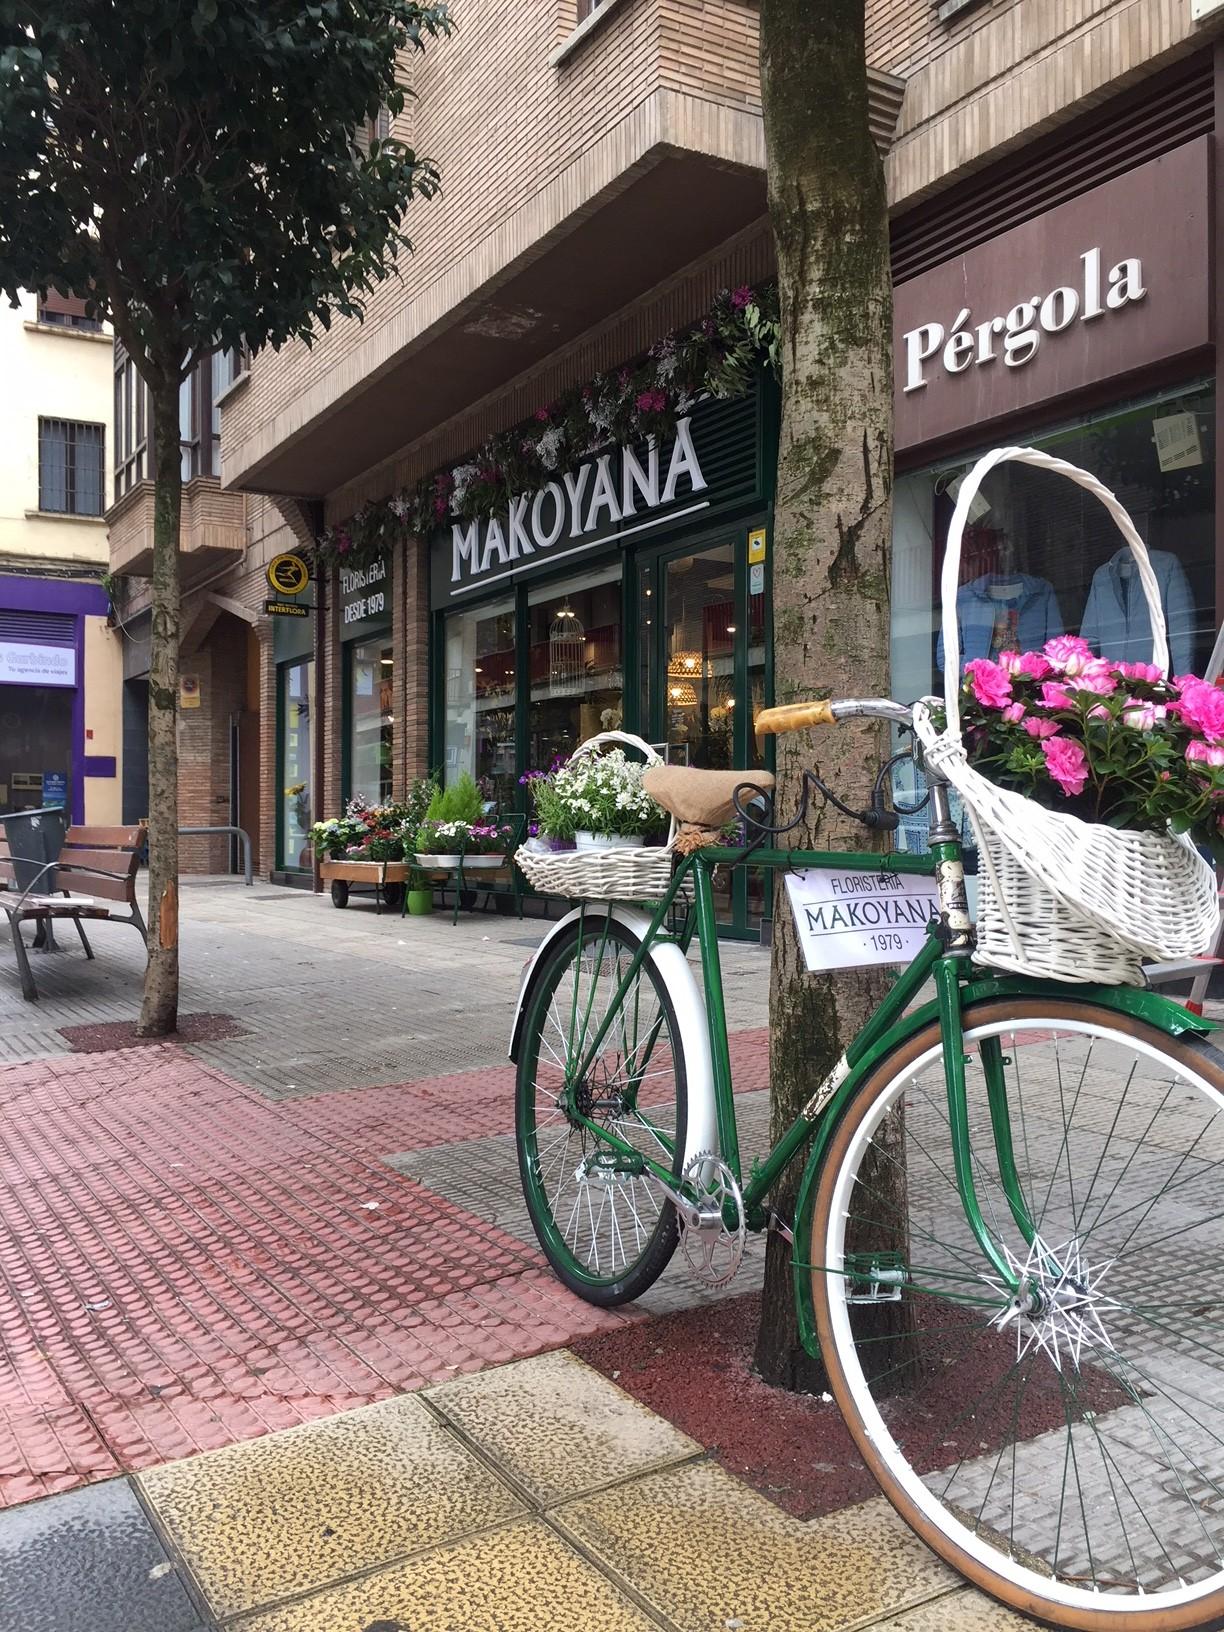 fachada_comercio_local_cartel_letras_escaparate_floristeria_decoracion_exterior_calle_ESTELLA_NAVARRA_IMPRESIÓN_DISEÑO_VINILOS_ROTULACIÓN